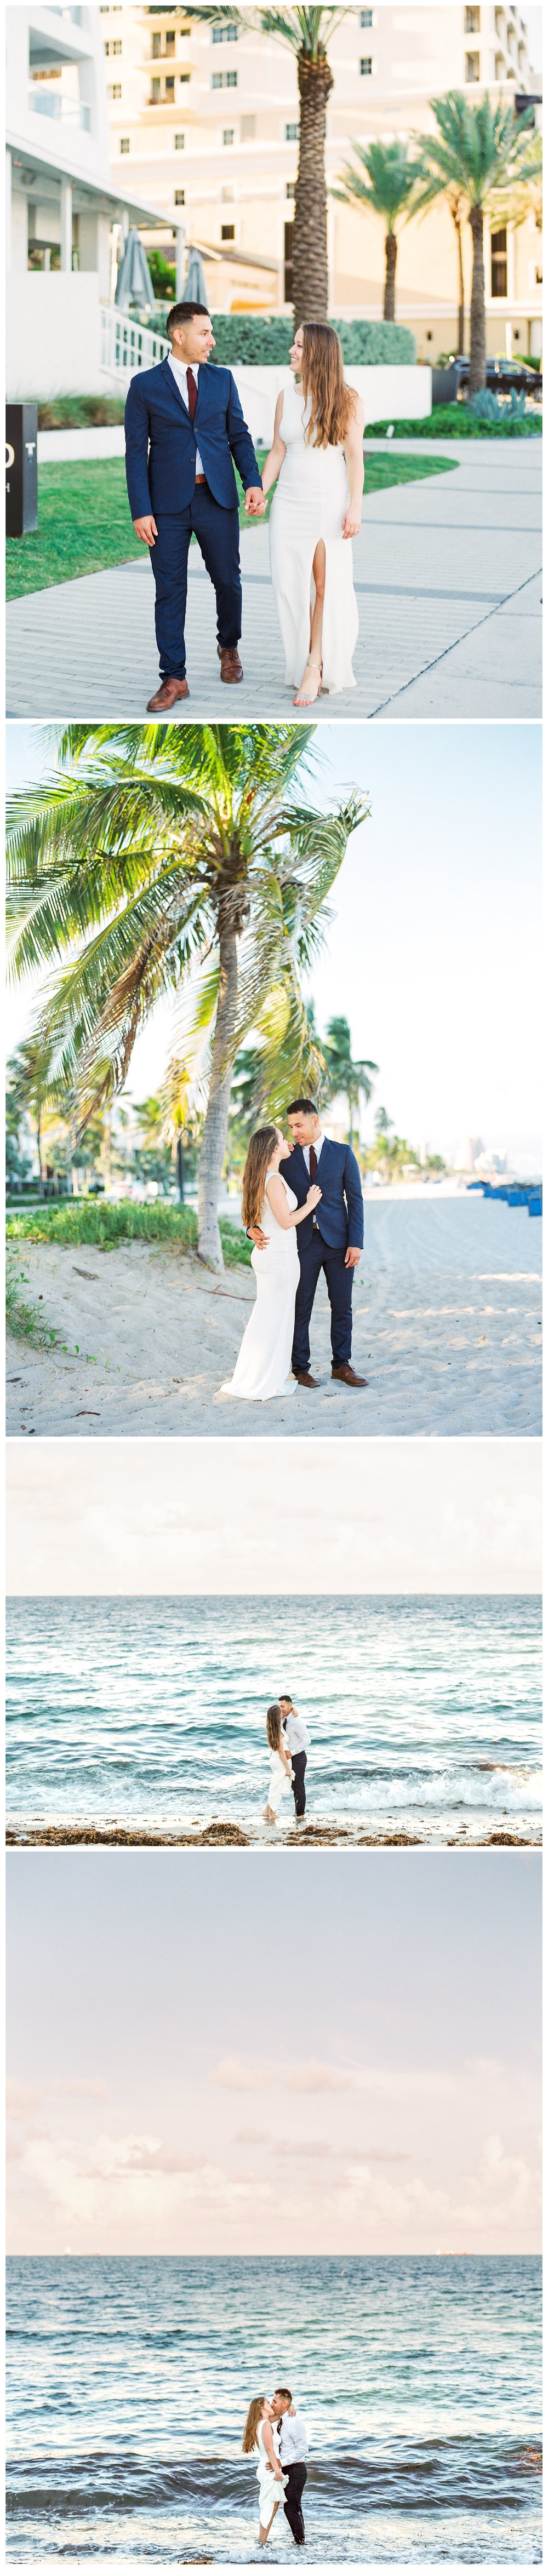 conrad fort lauderdale beach by hilton hotels wedding photos